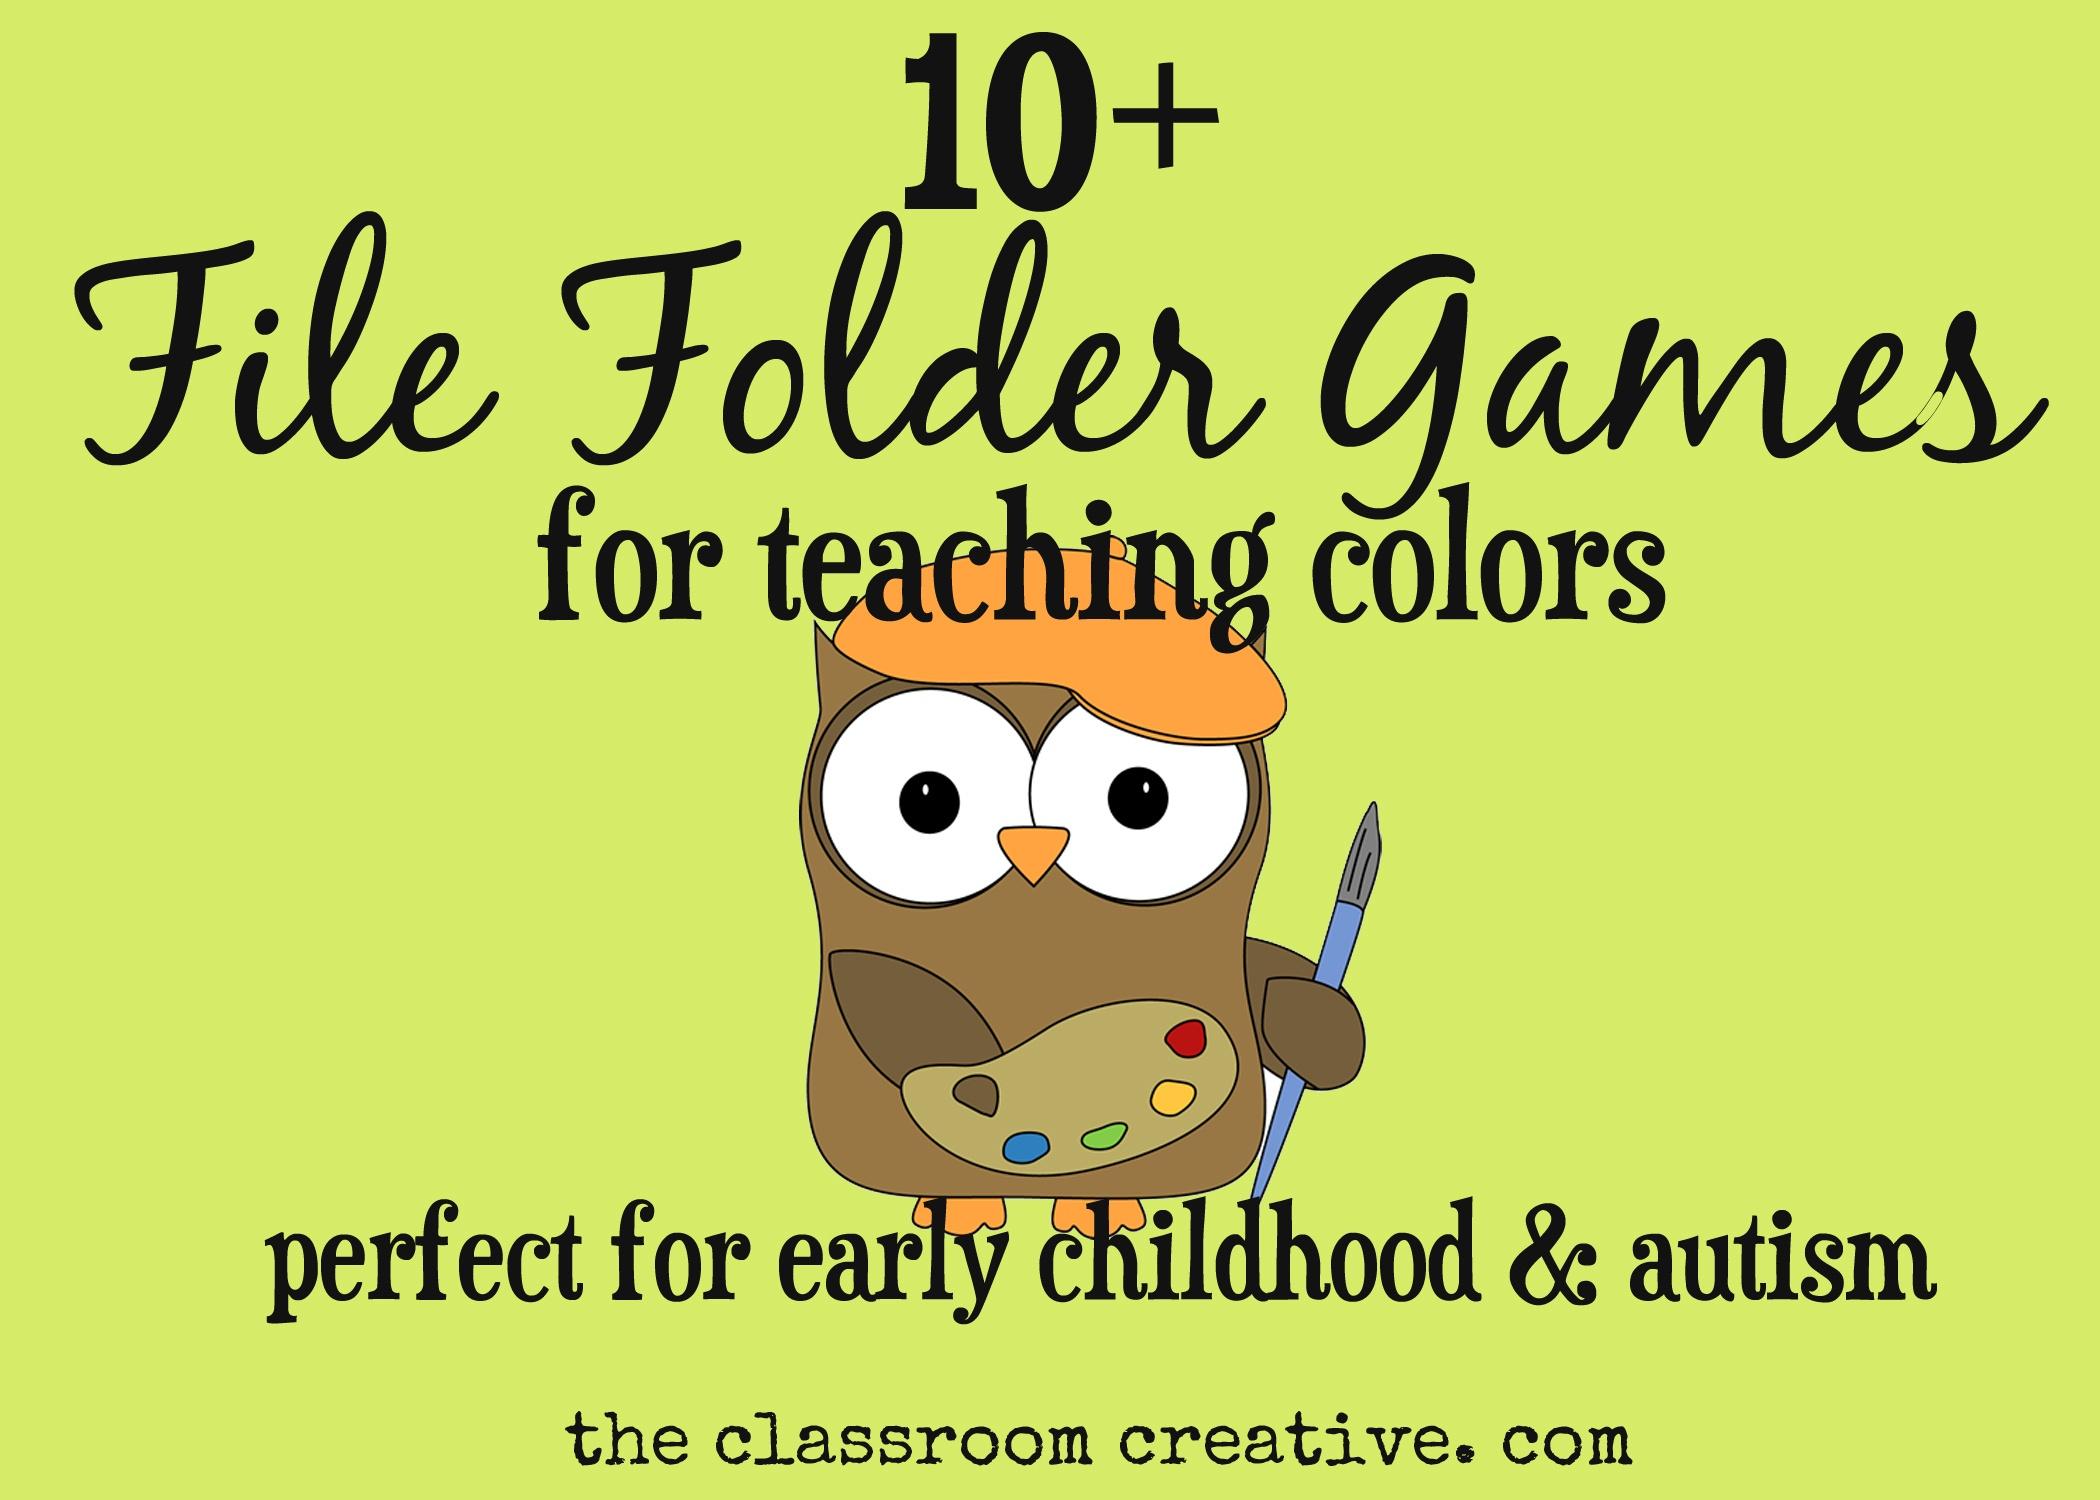 File Folder Games For Teaching Colors - Free Printable Preschool Folder Games